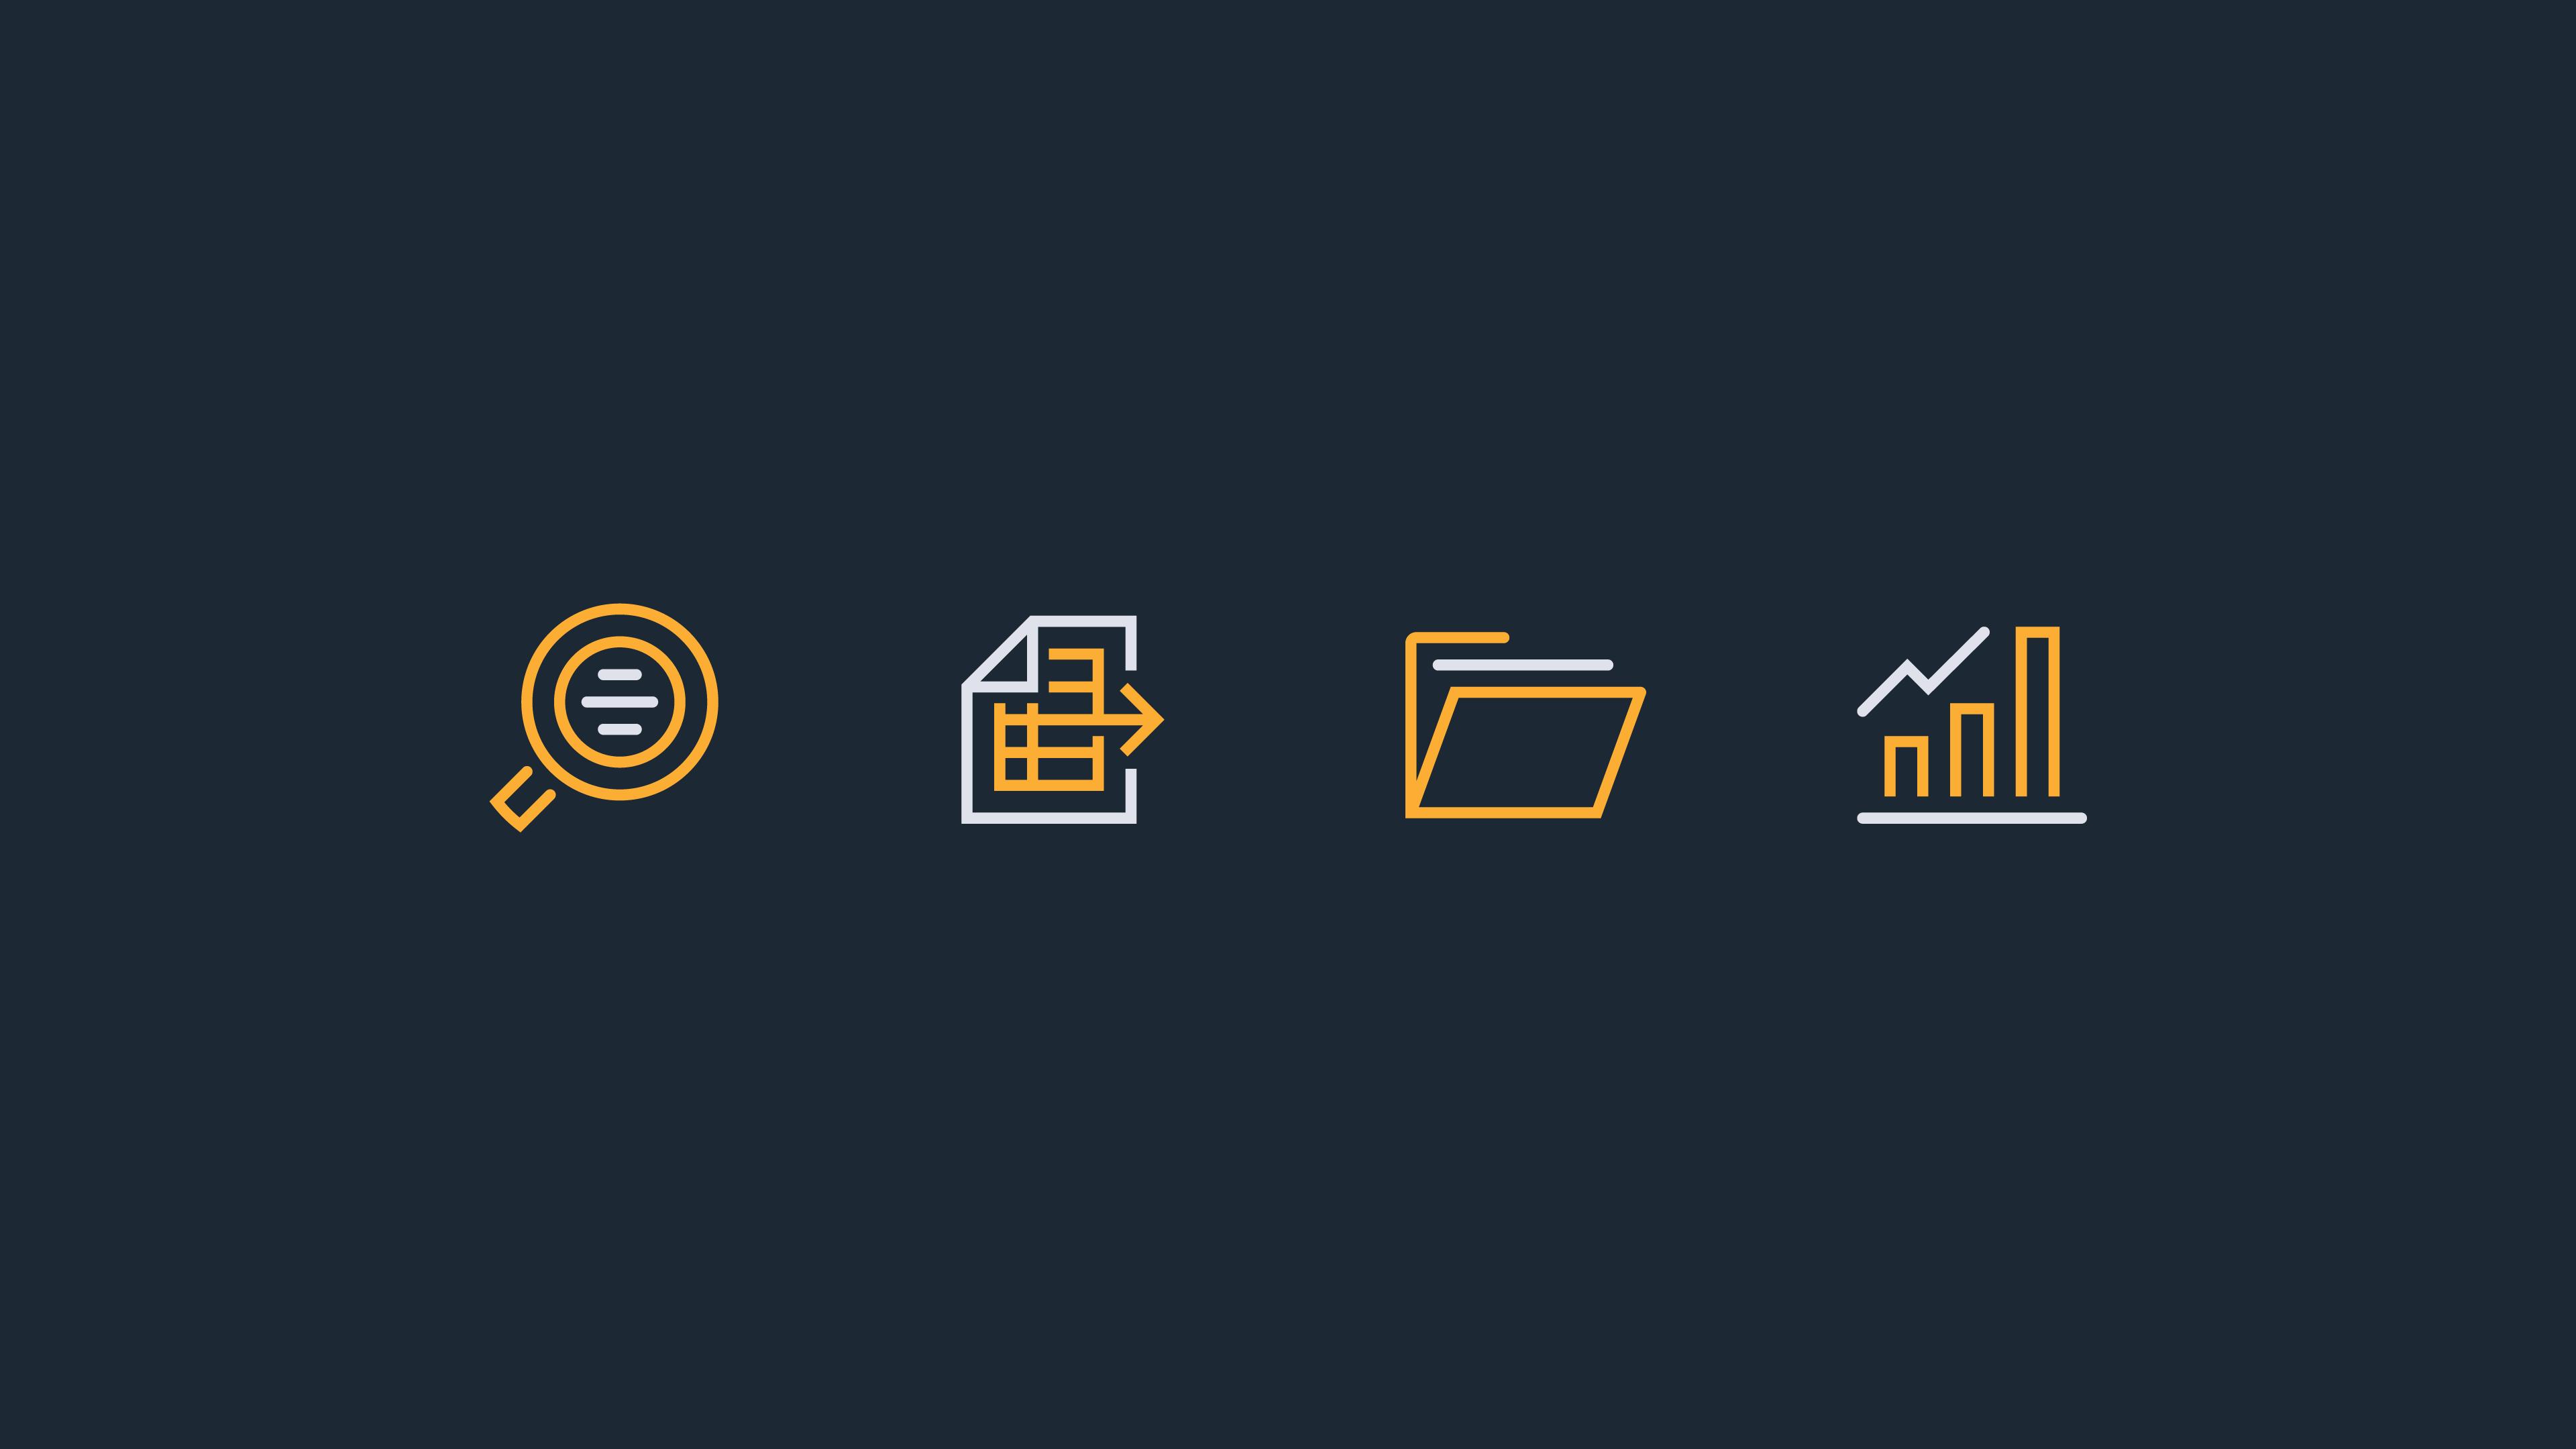 tn icons